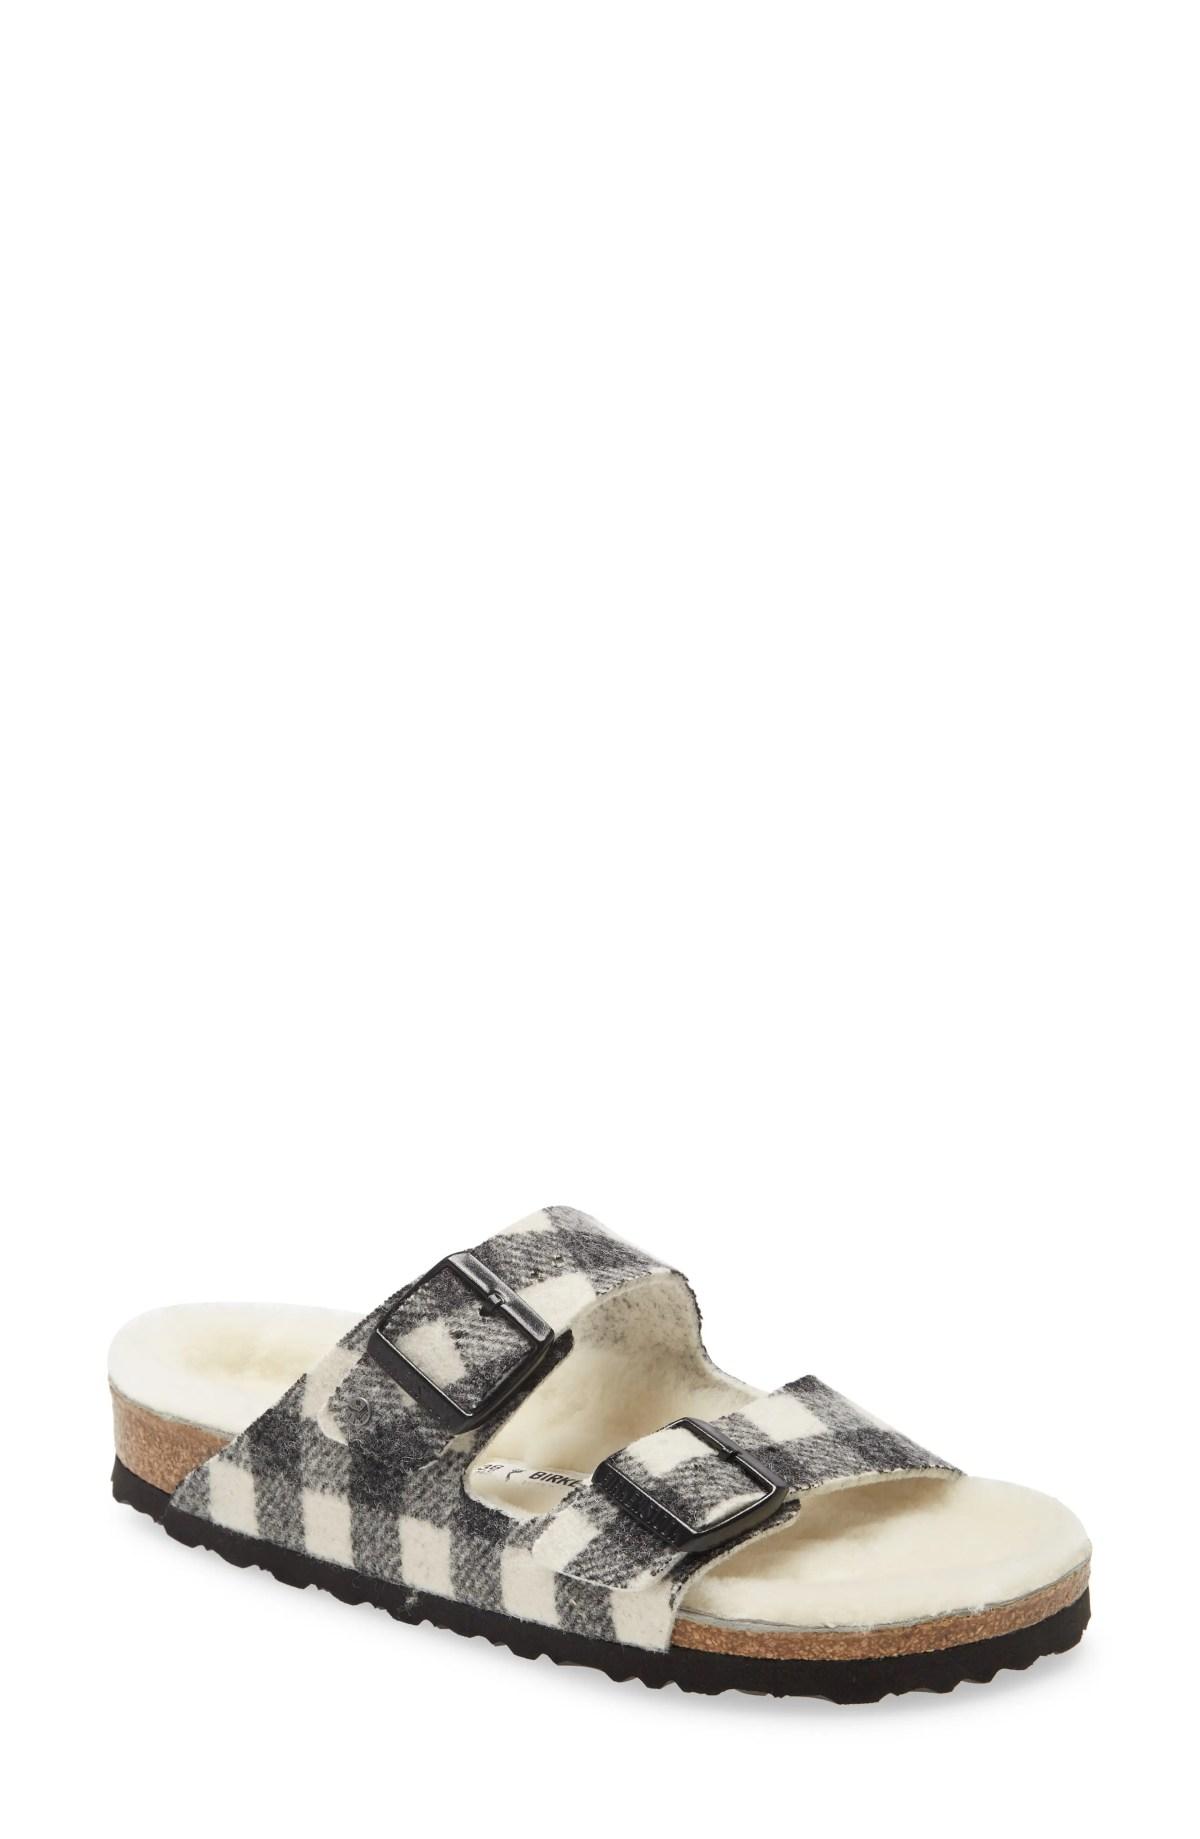 BIRKENSTOCK Arizona Genuine Shearling Slide Sandal, Main, color, PLAID WHITE WOOL